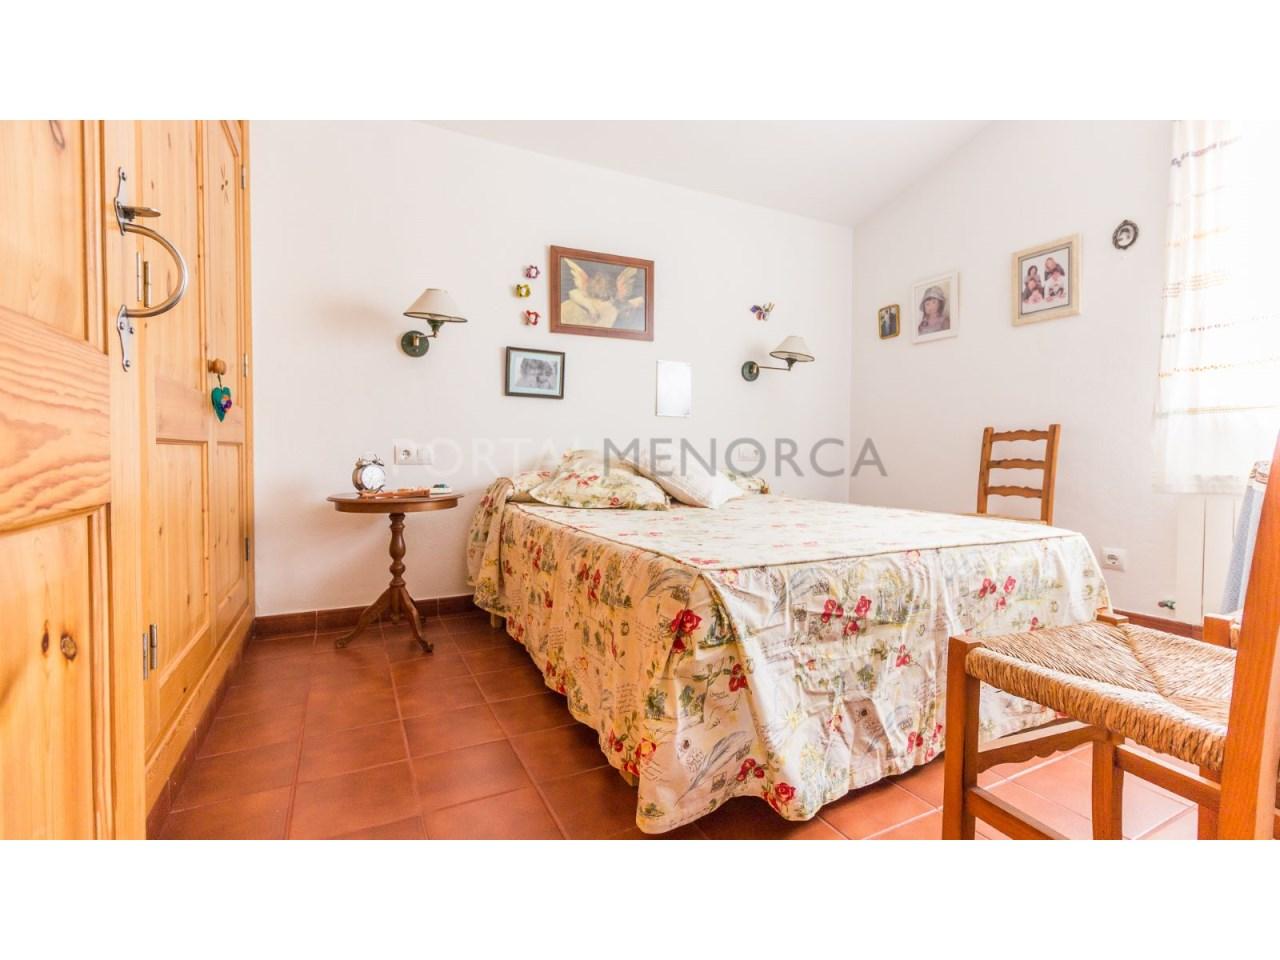 Country house for sale in Cala Galdana,Menorca-Bedroom